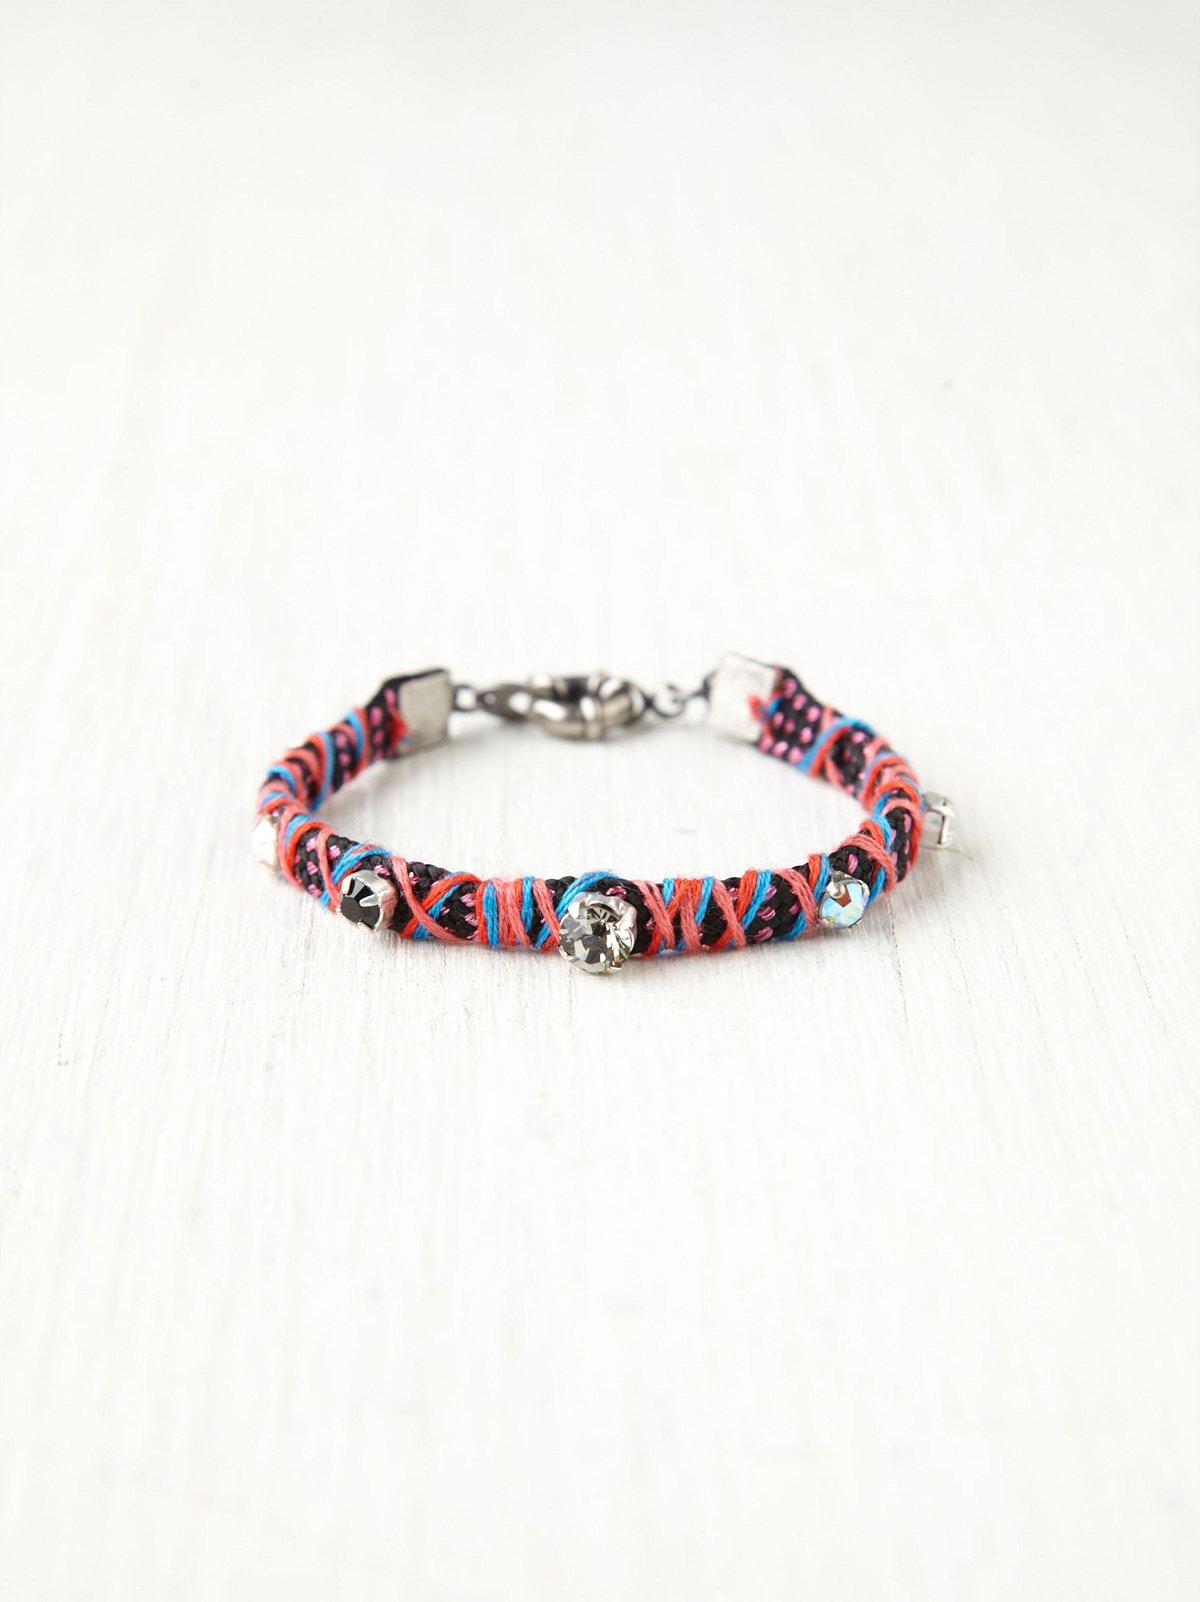 Rhinestone Studded Friendship Bracelet